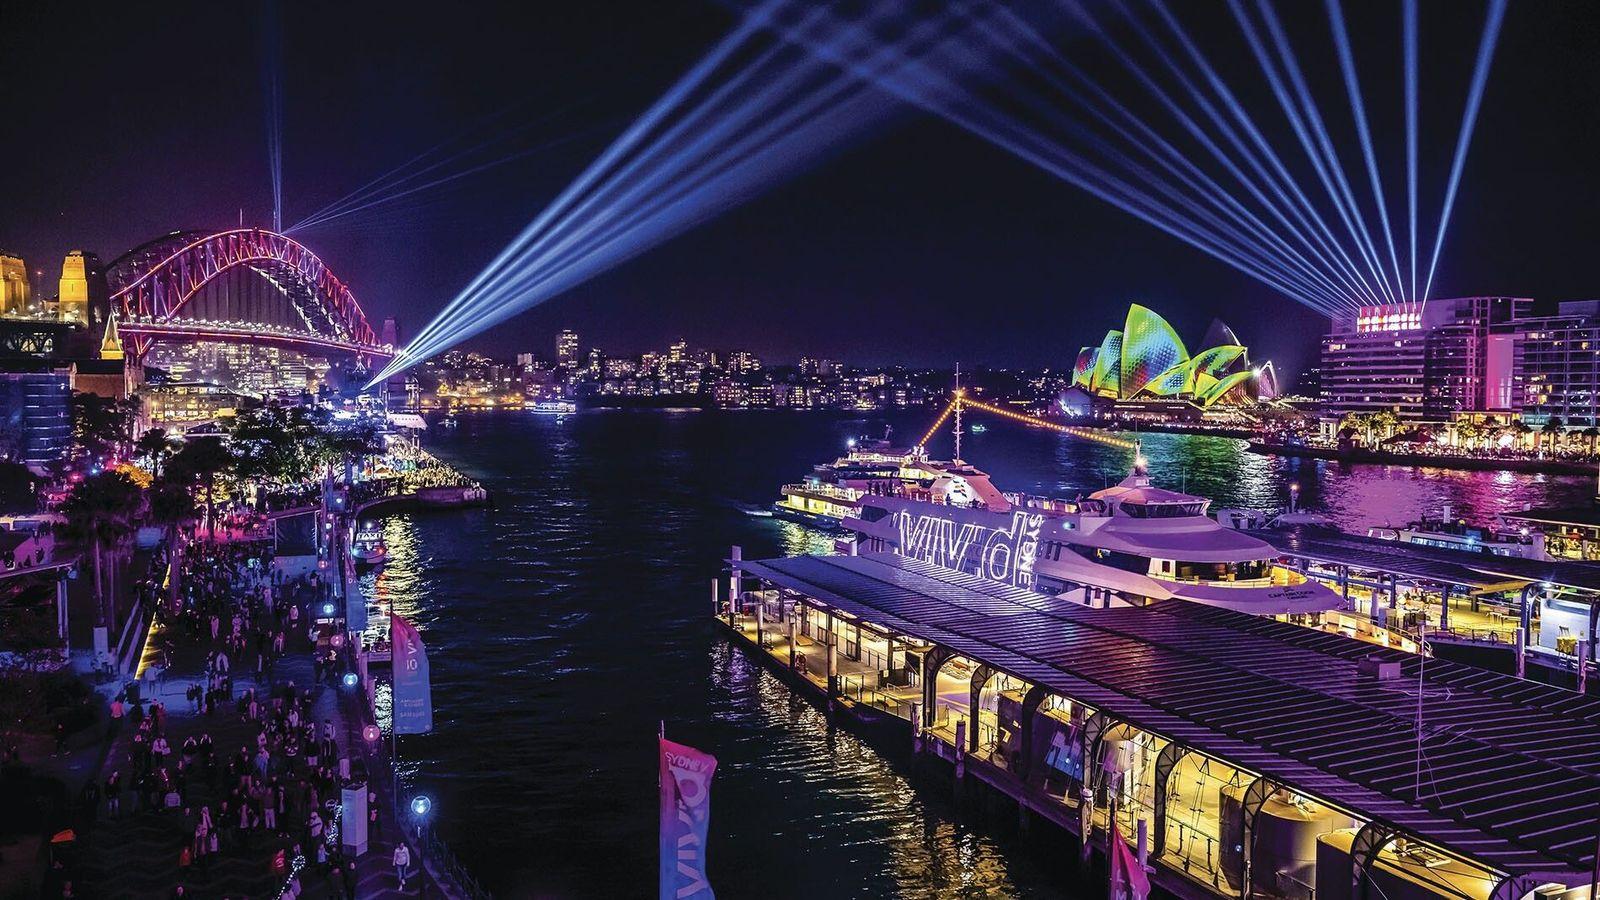 Sydney during the Vivid Sydney festival.